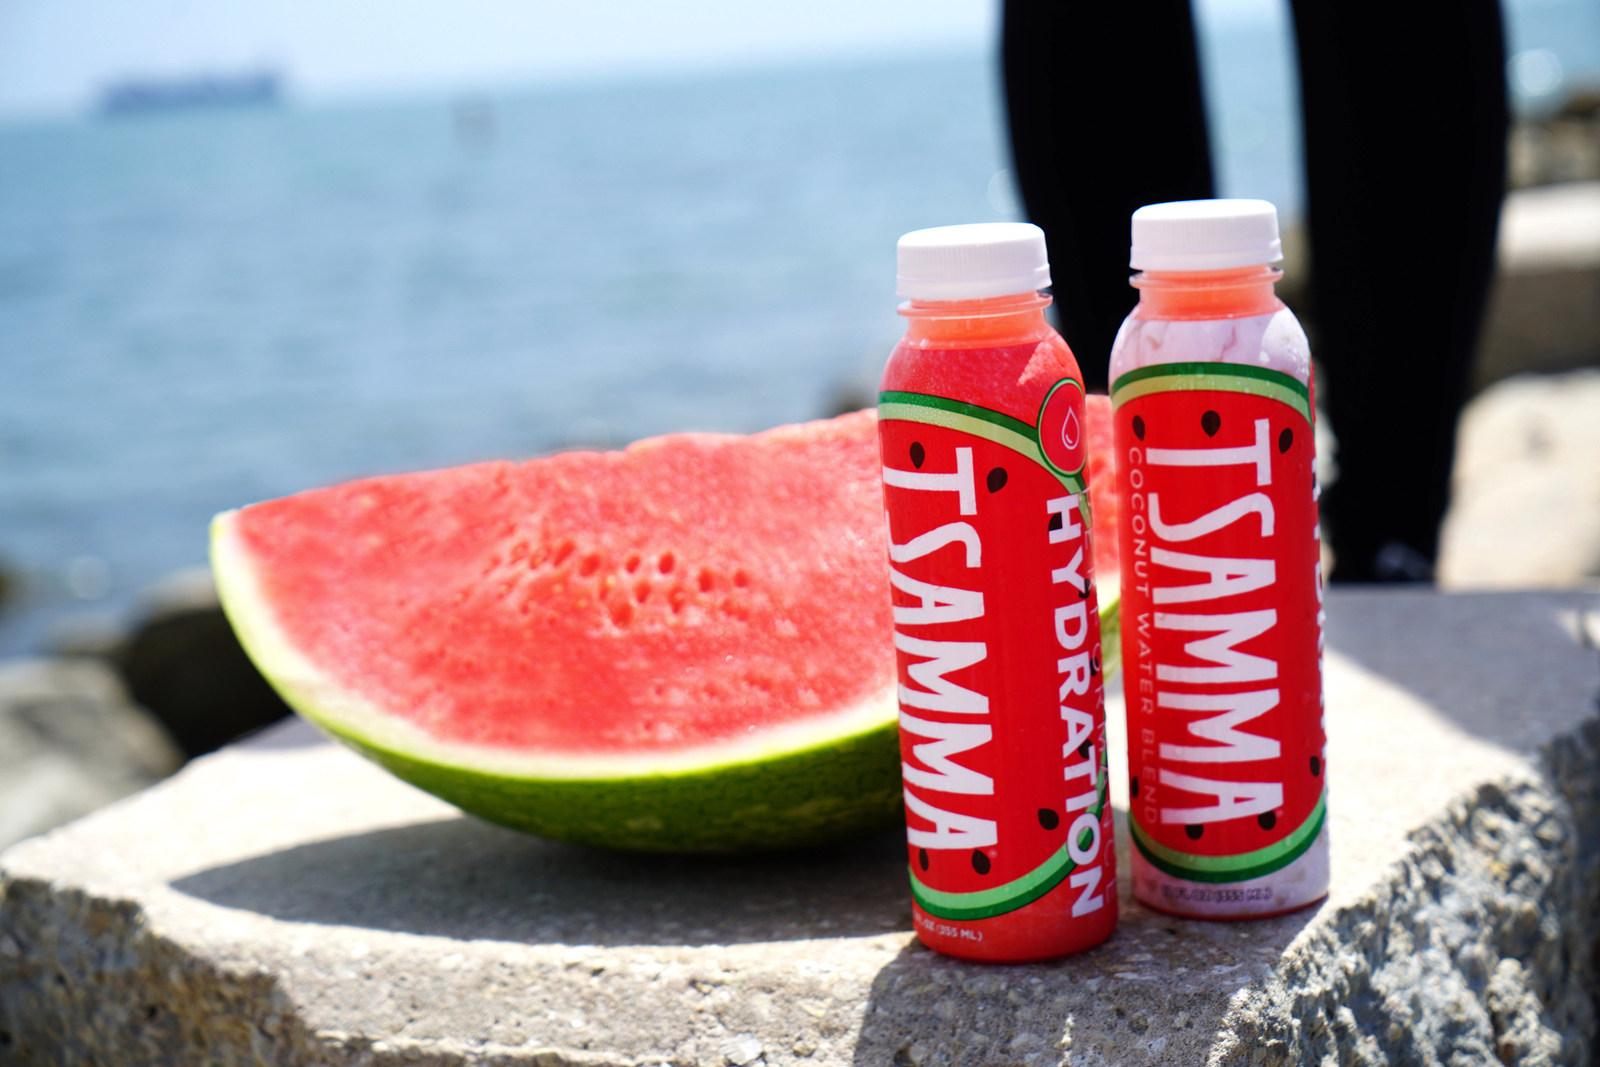 Tsamma Watermelon Juice Launches Watermelon Coconut Water Blend